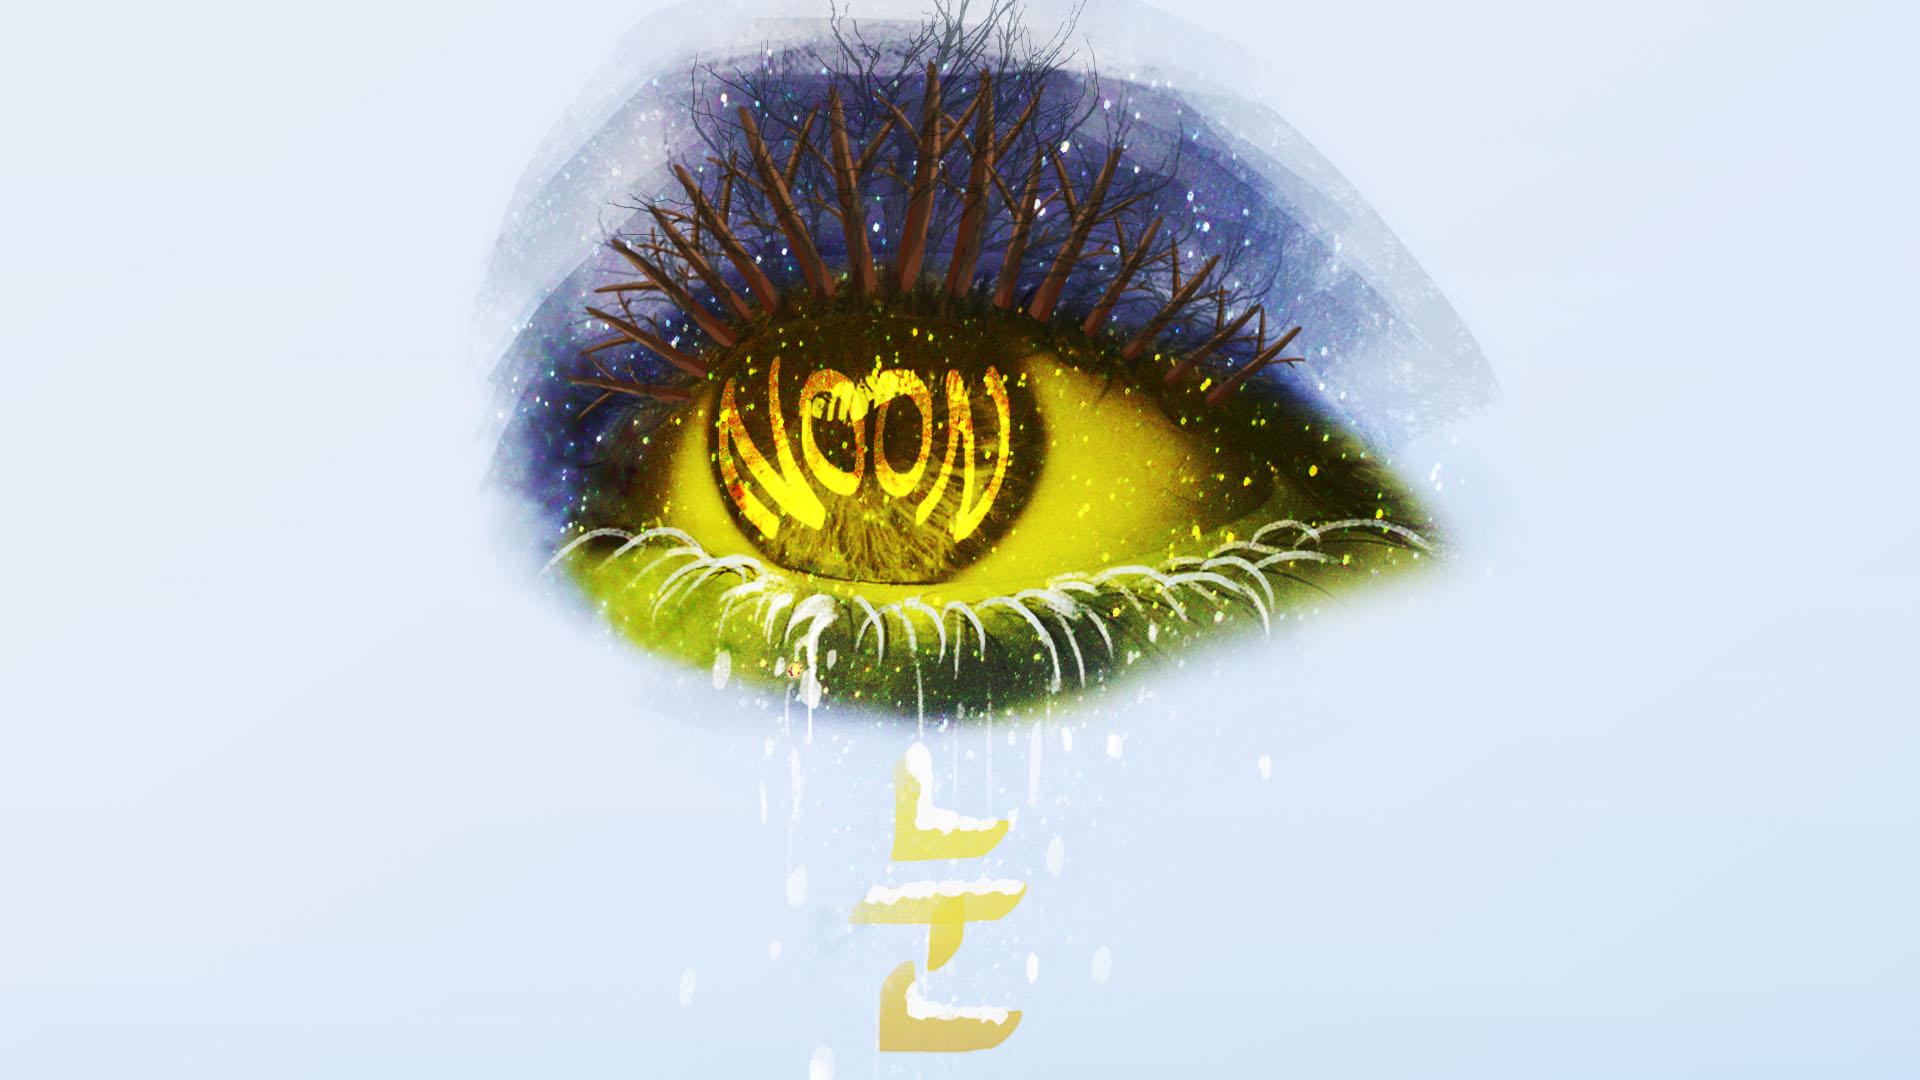 Noo_Eye_Snow_F08_v01_kk.jpg